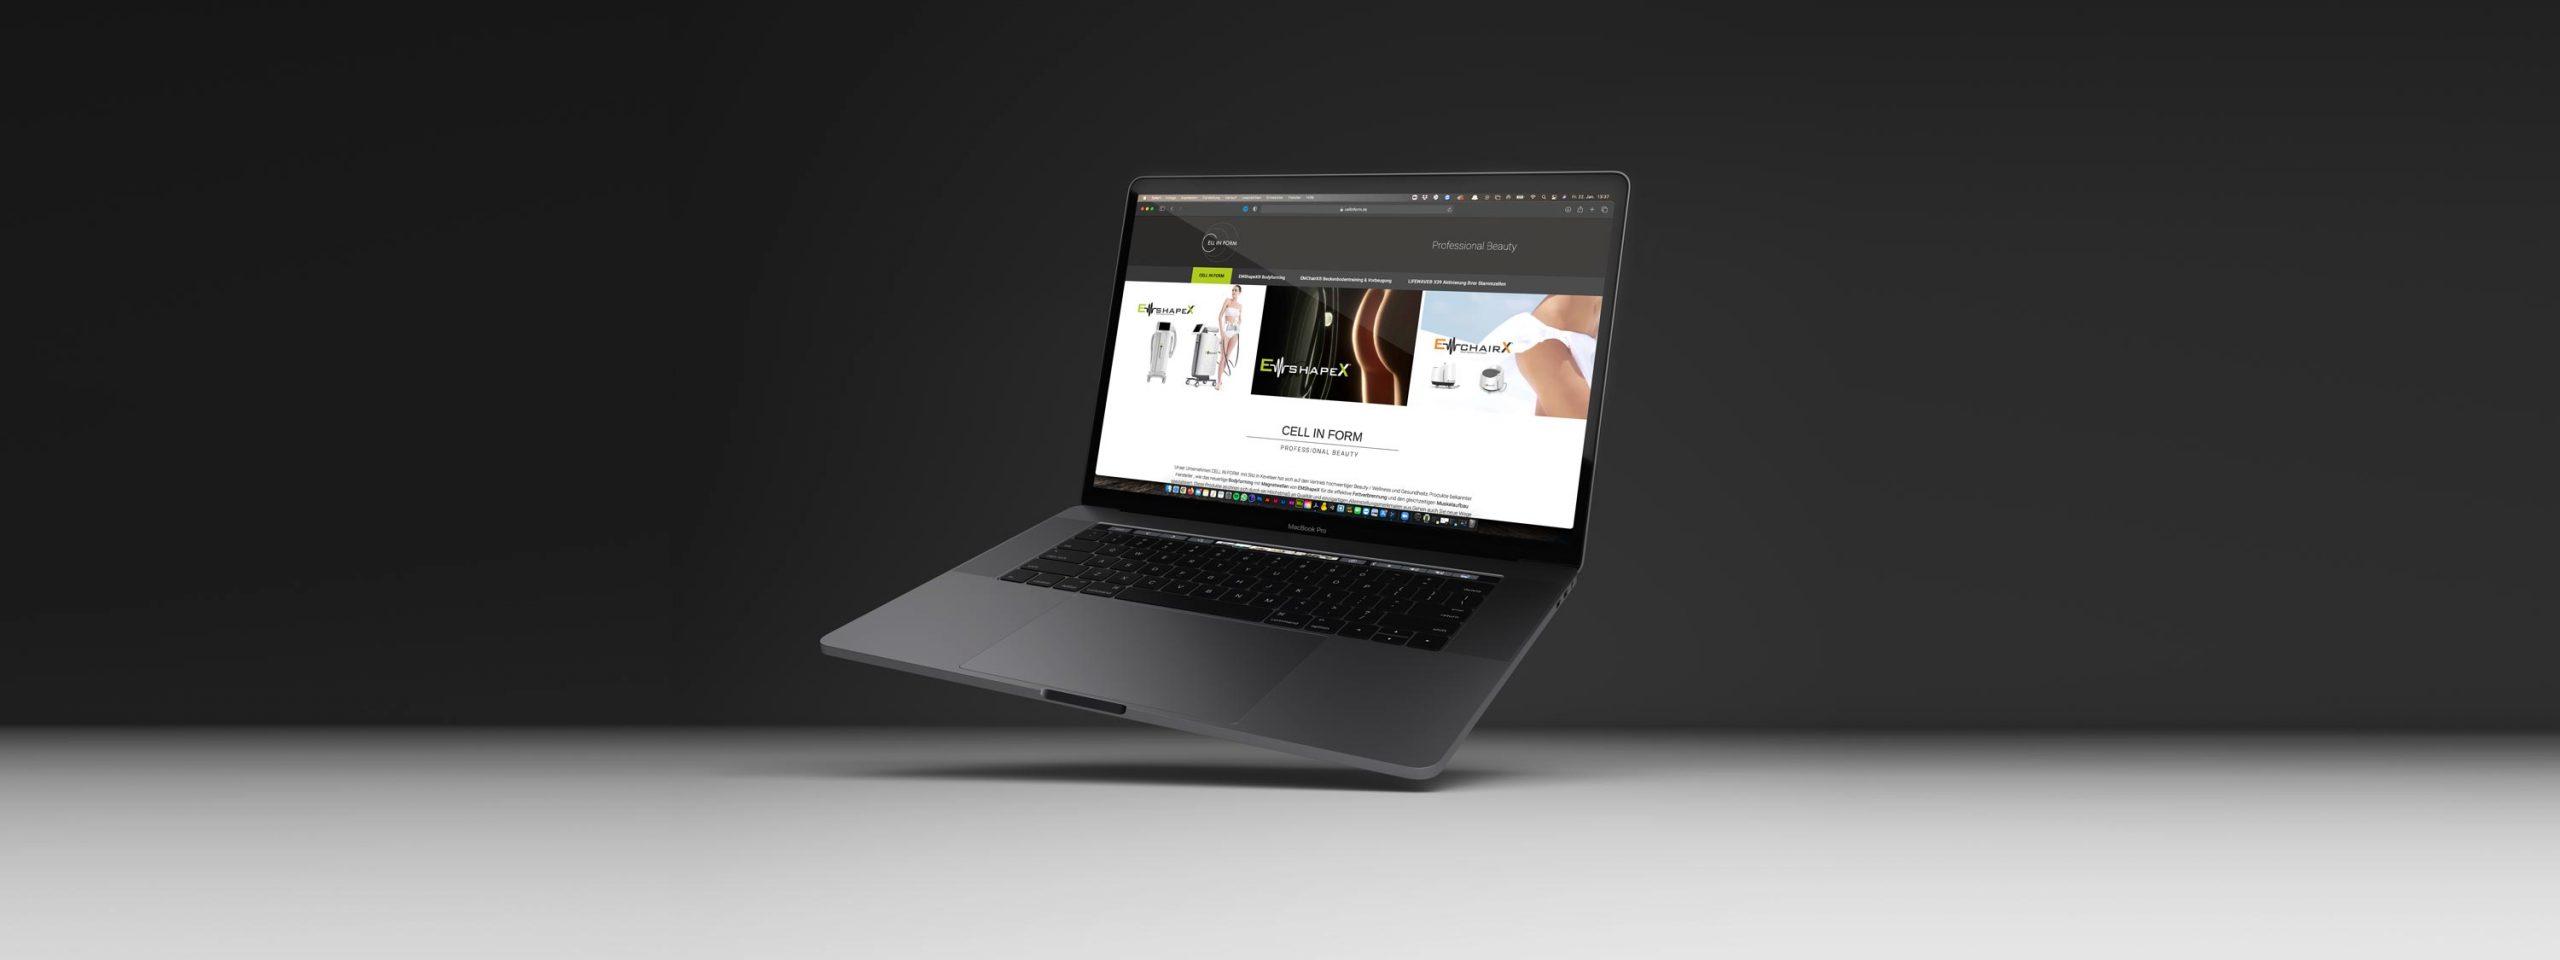 Cellinform-Laptop-Mockup